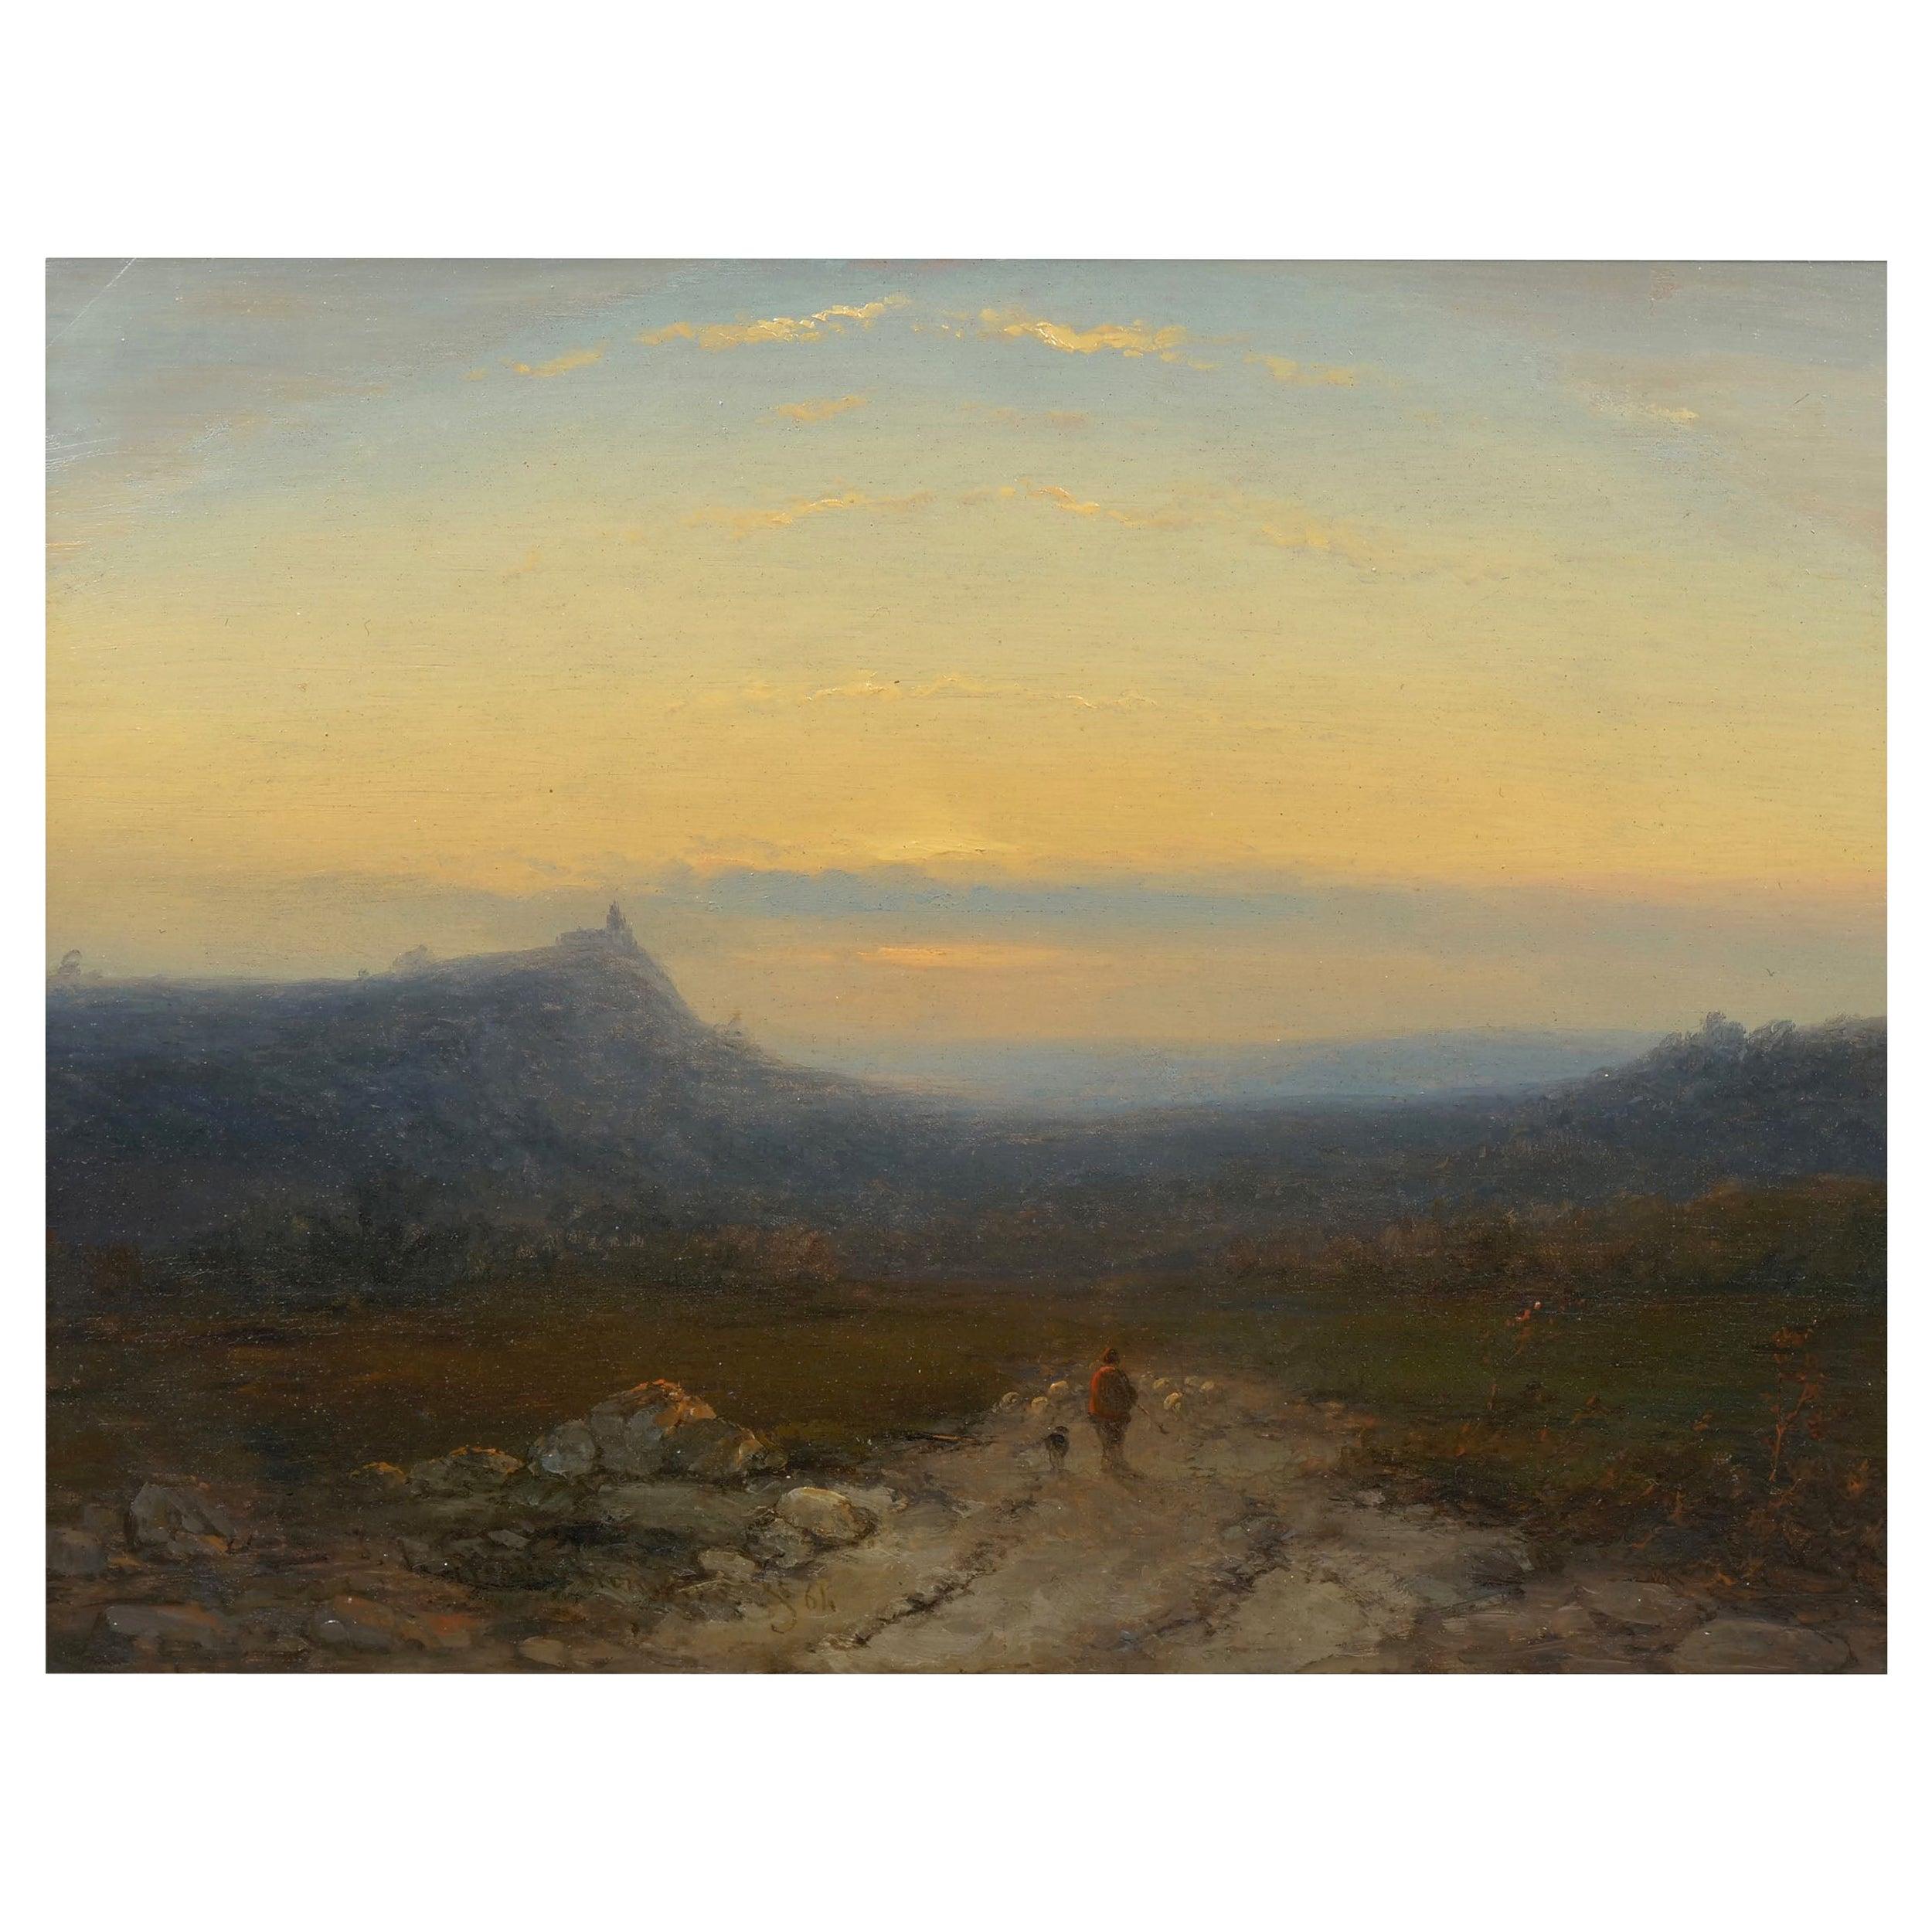 Antique 19th Century Oil Landscape Painting of Shepherd by J. Hoppenbrouwers